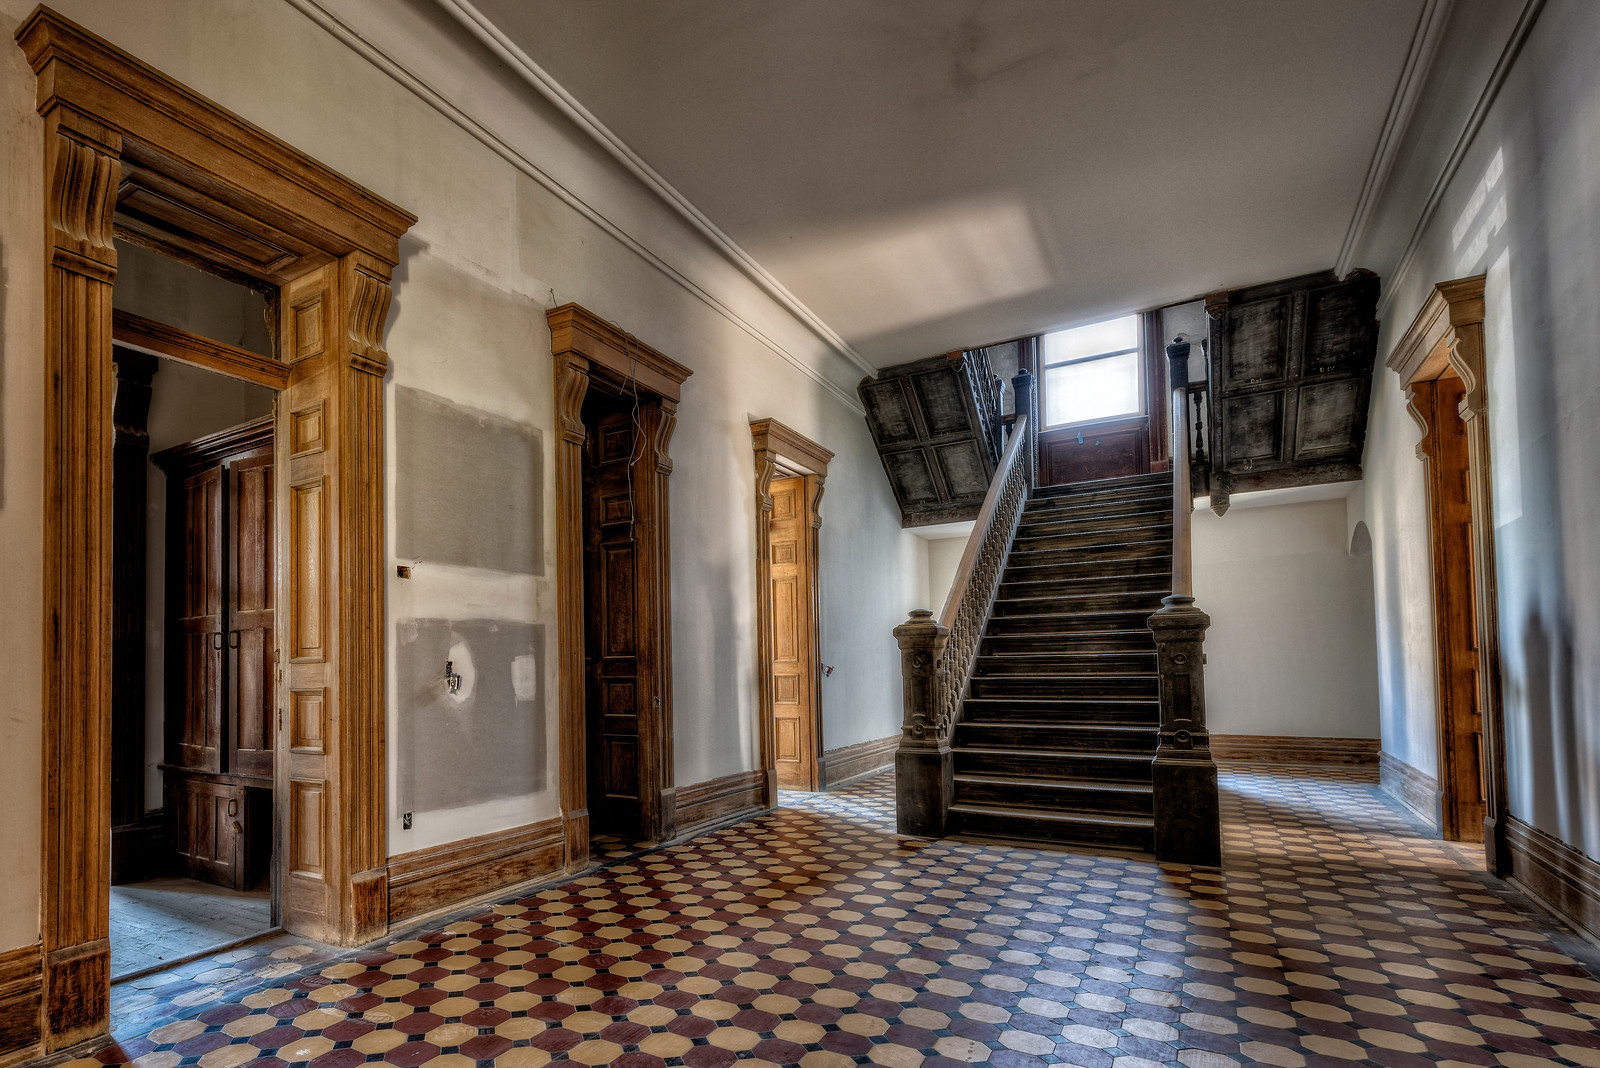 Ohio State Reformatory 1st floor